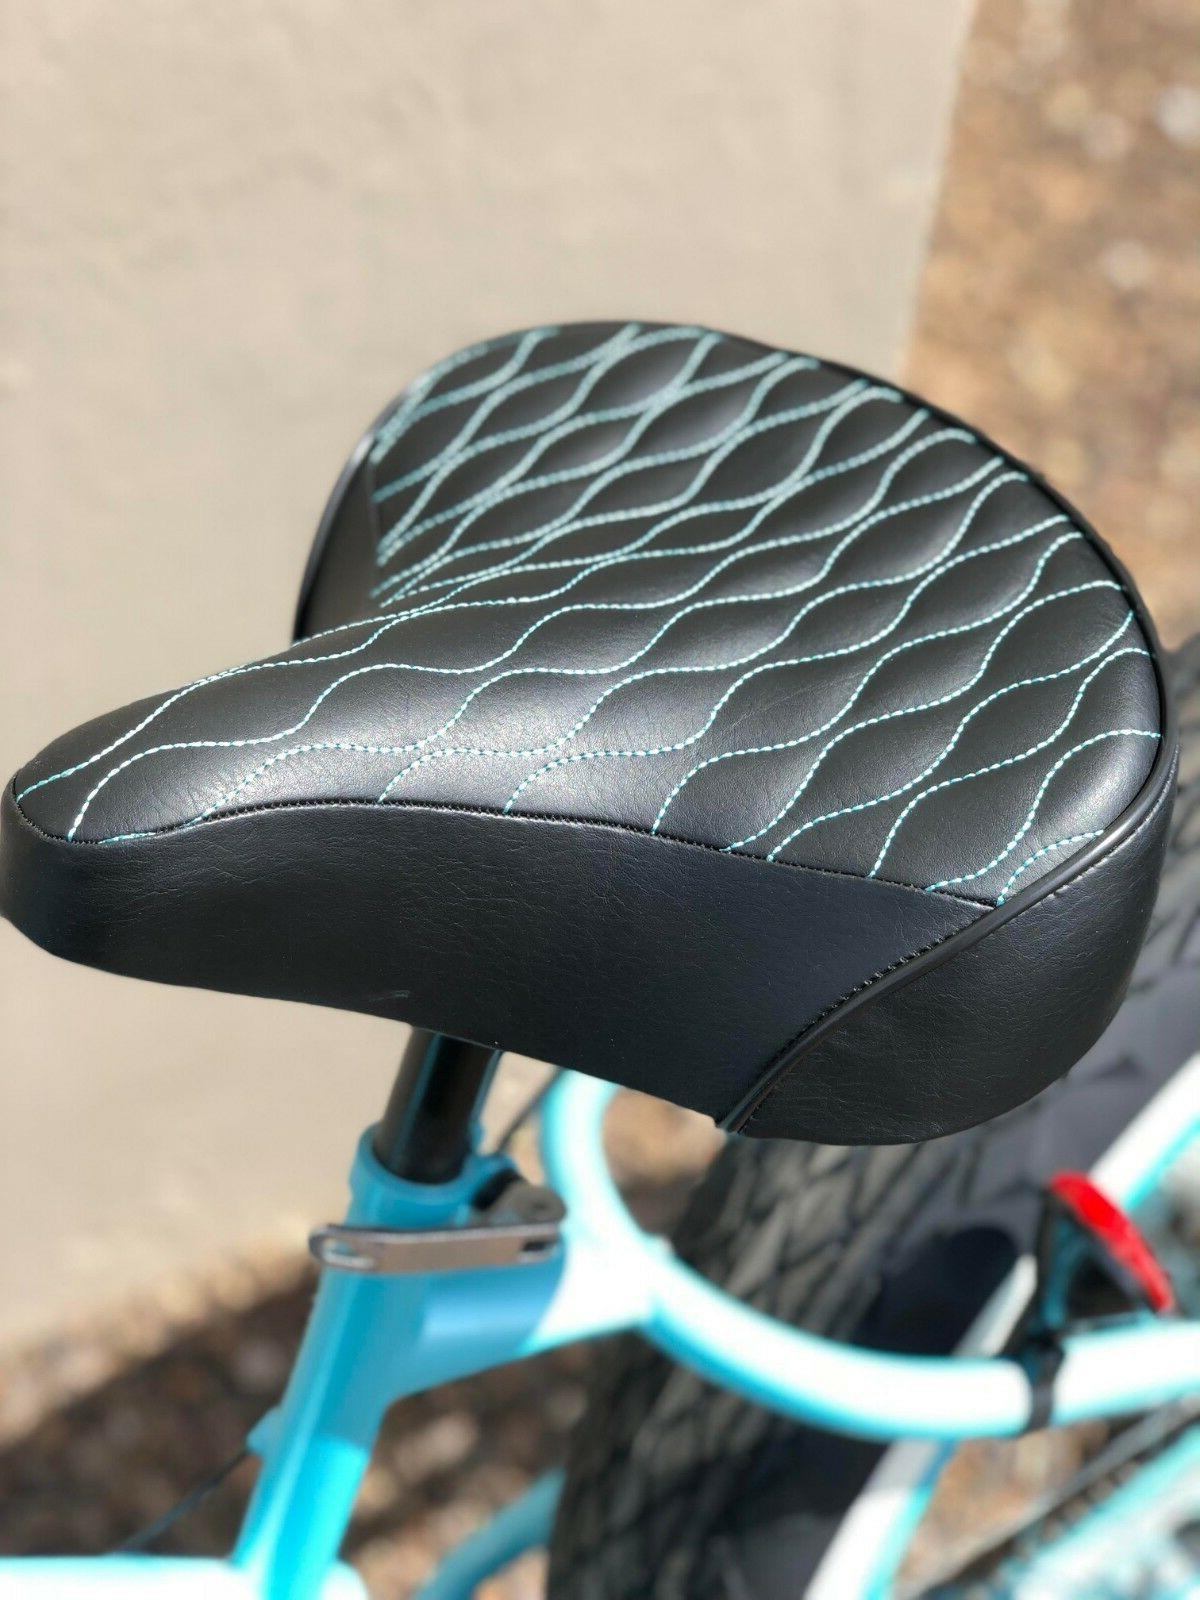 TEAL STITCHING Custom Beach Cruiser Comfortable Bicycle Seat